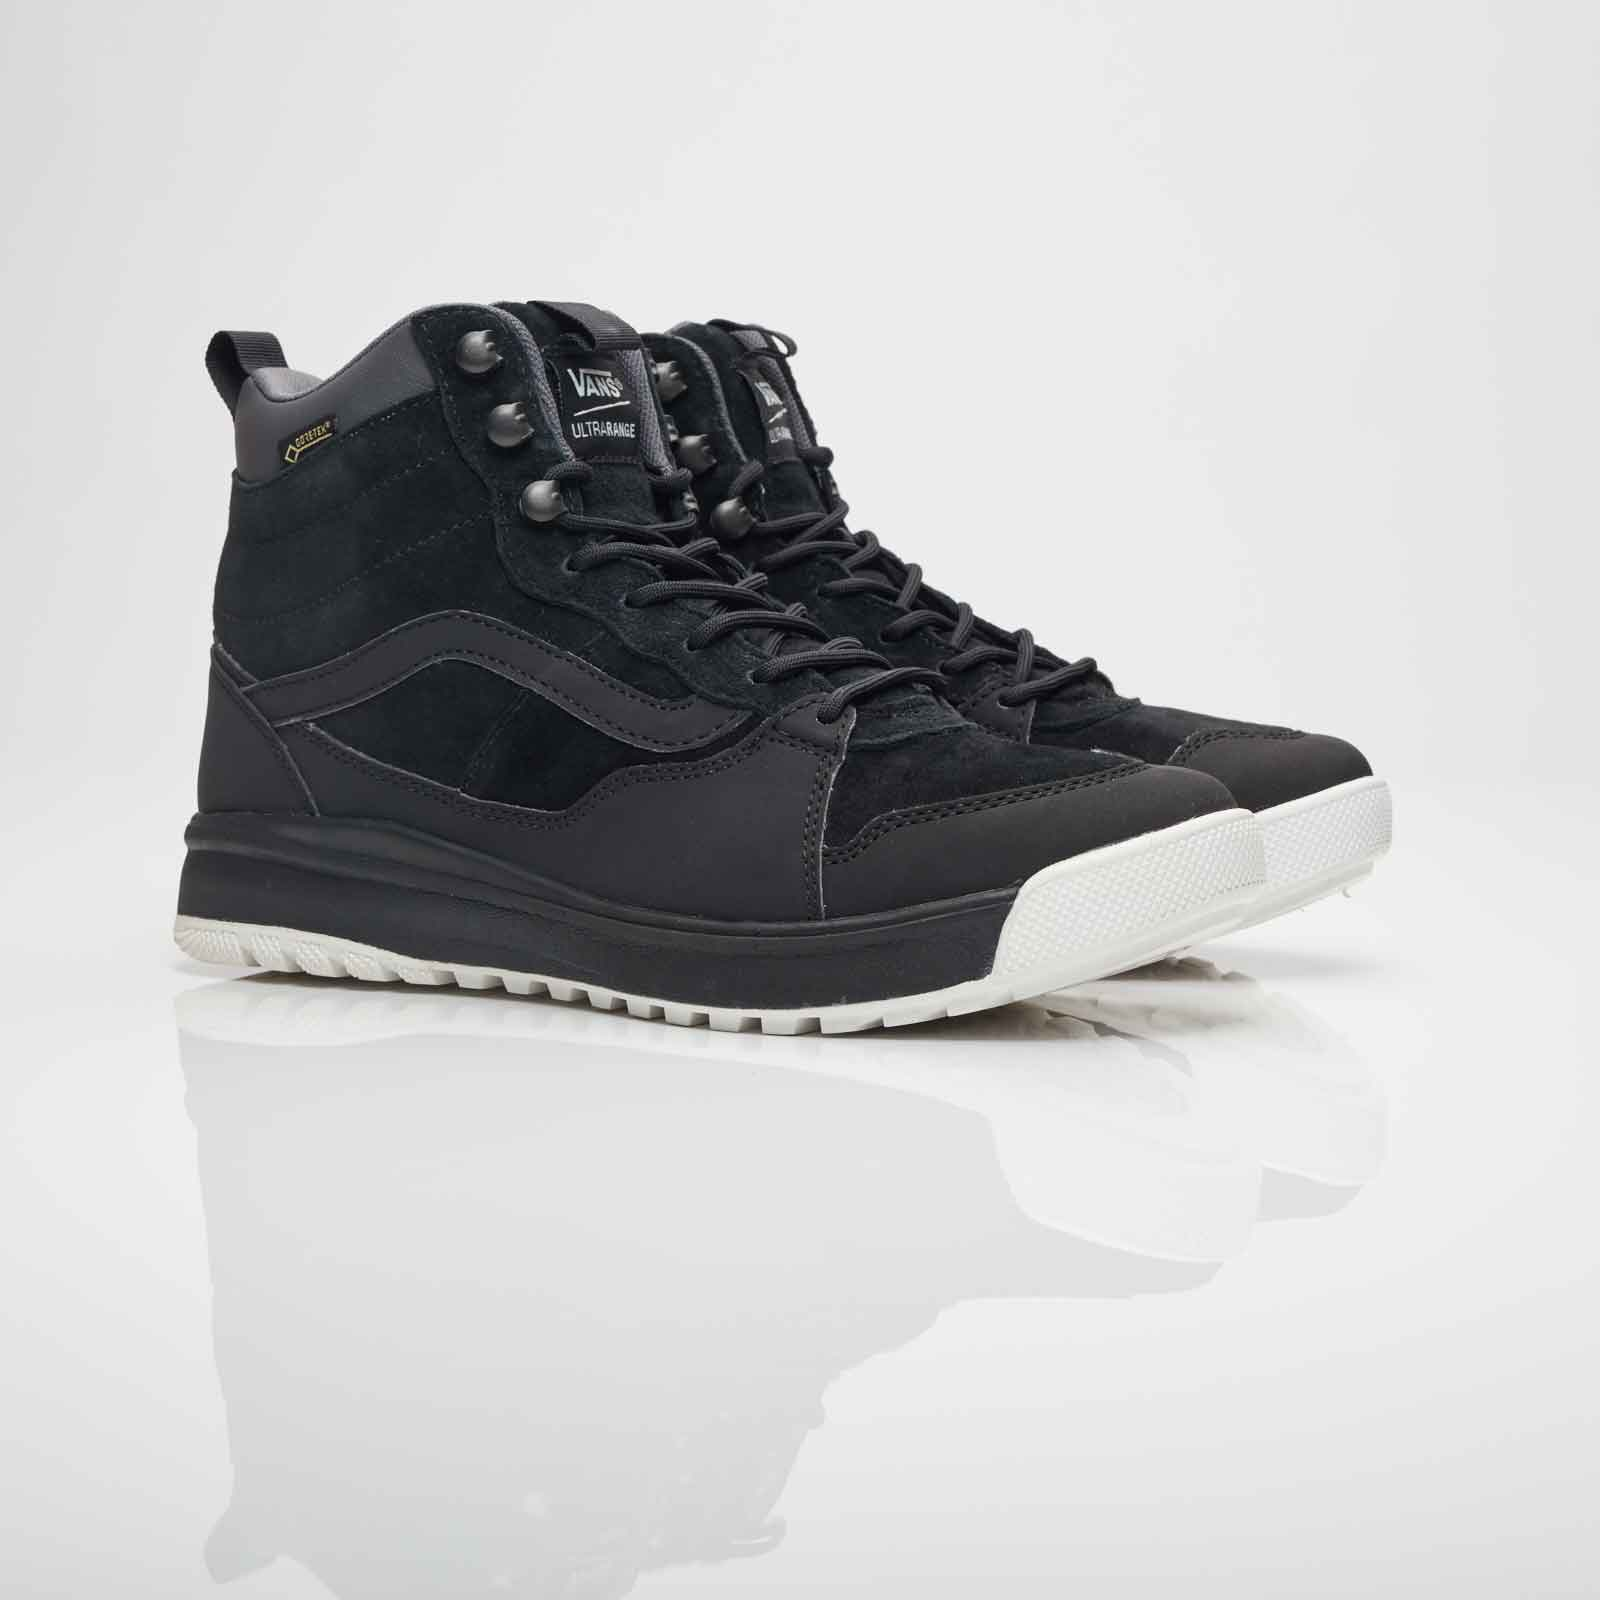 Vans UltraRange Hi Gore Tex Vn0a3dp5on3 Sneakersnstuff